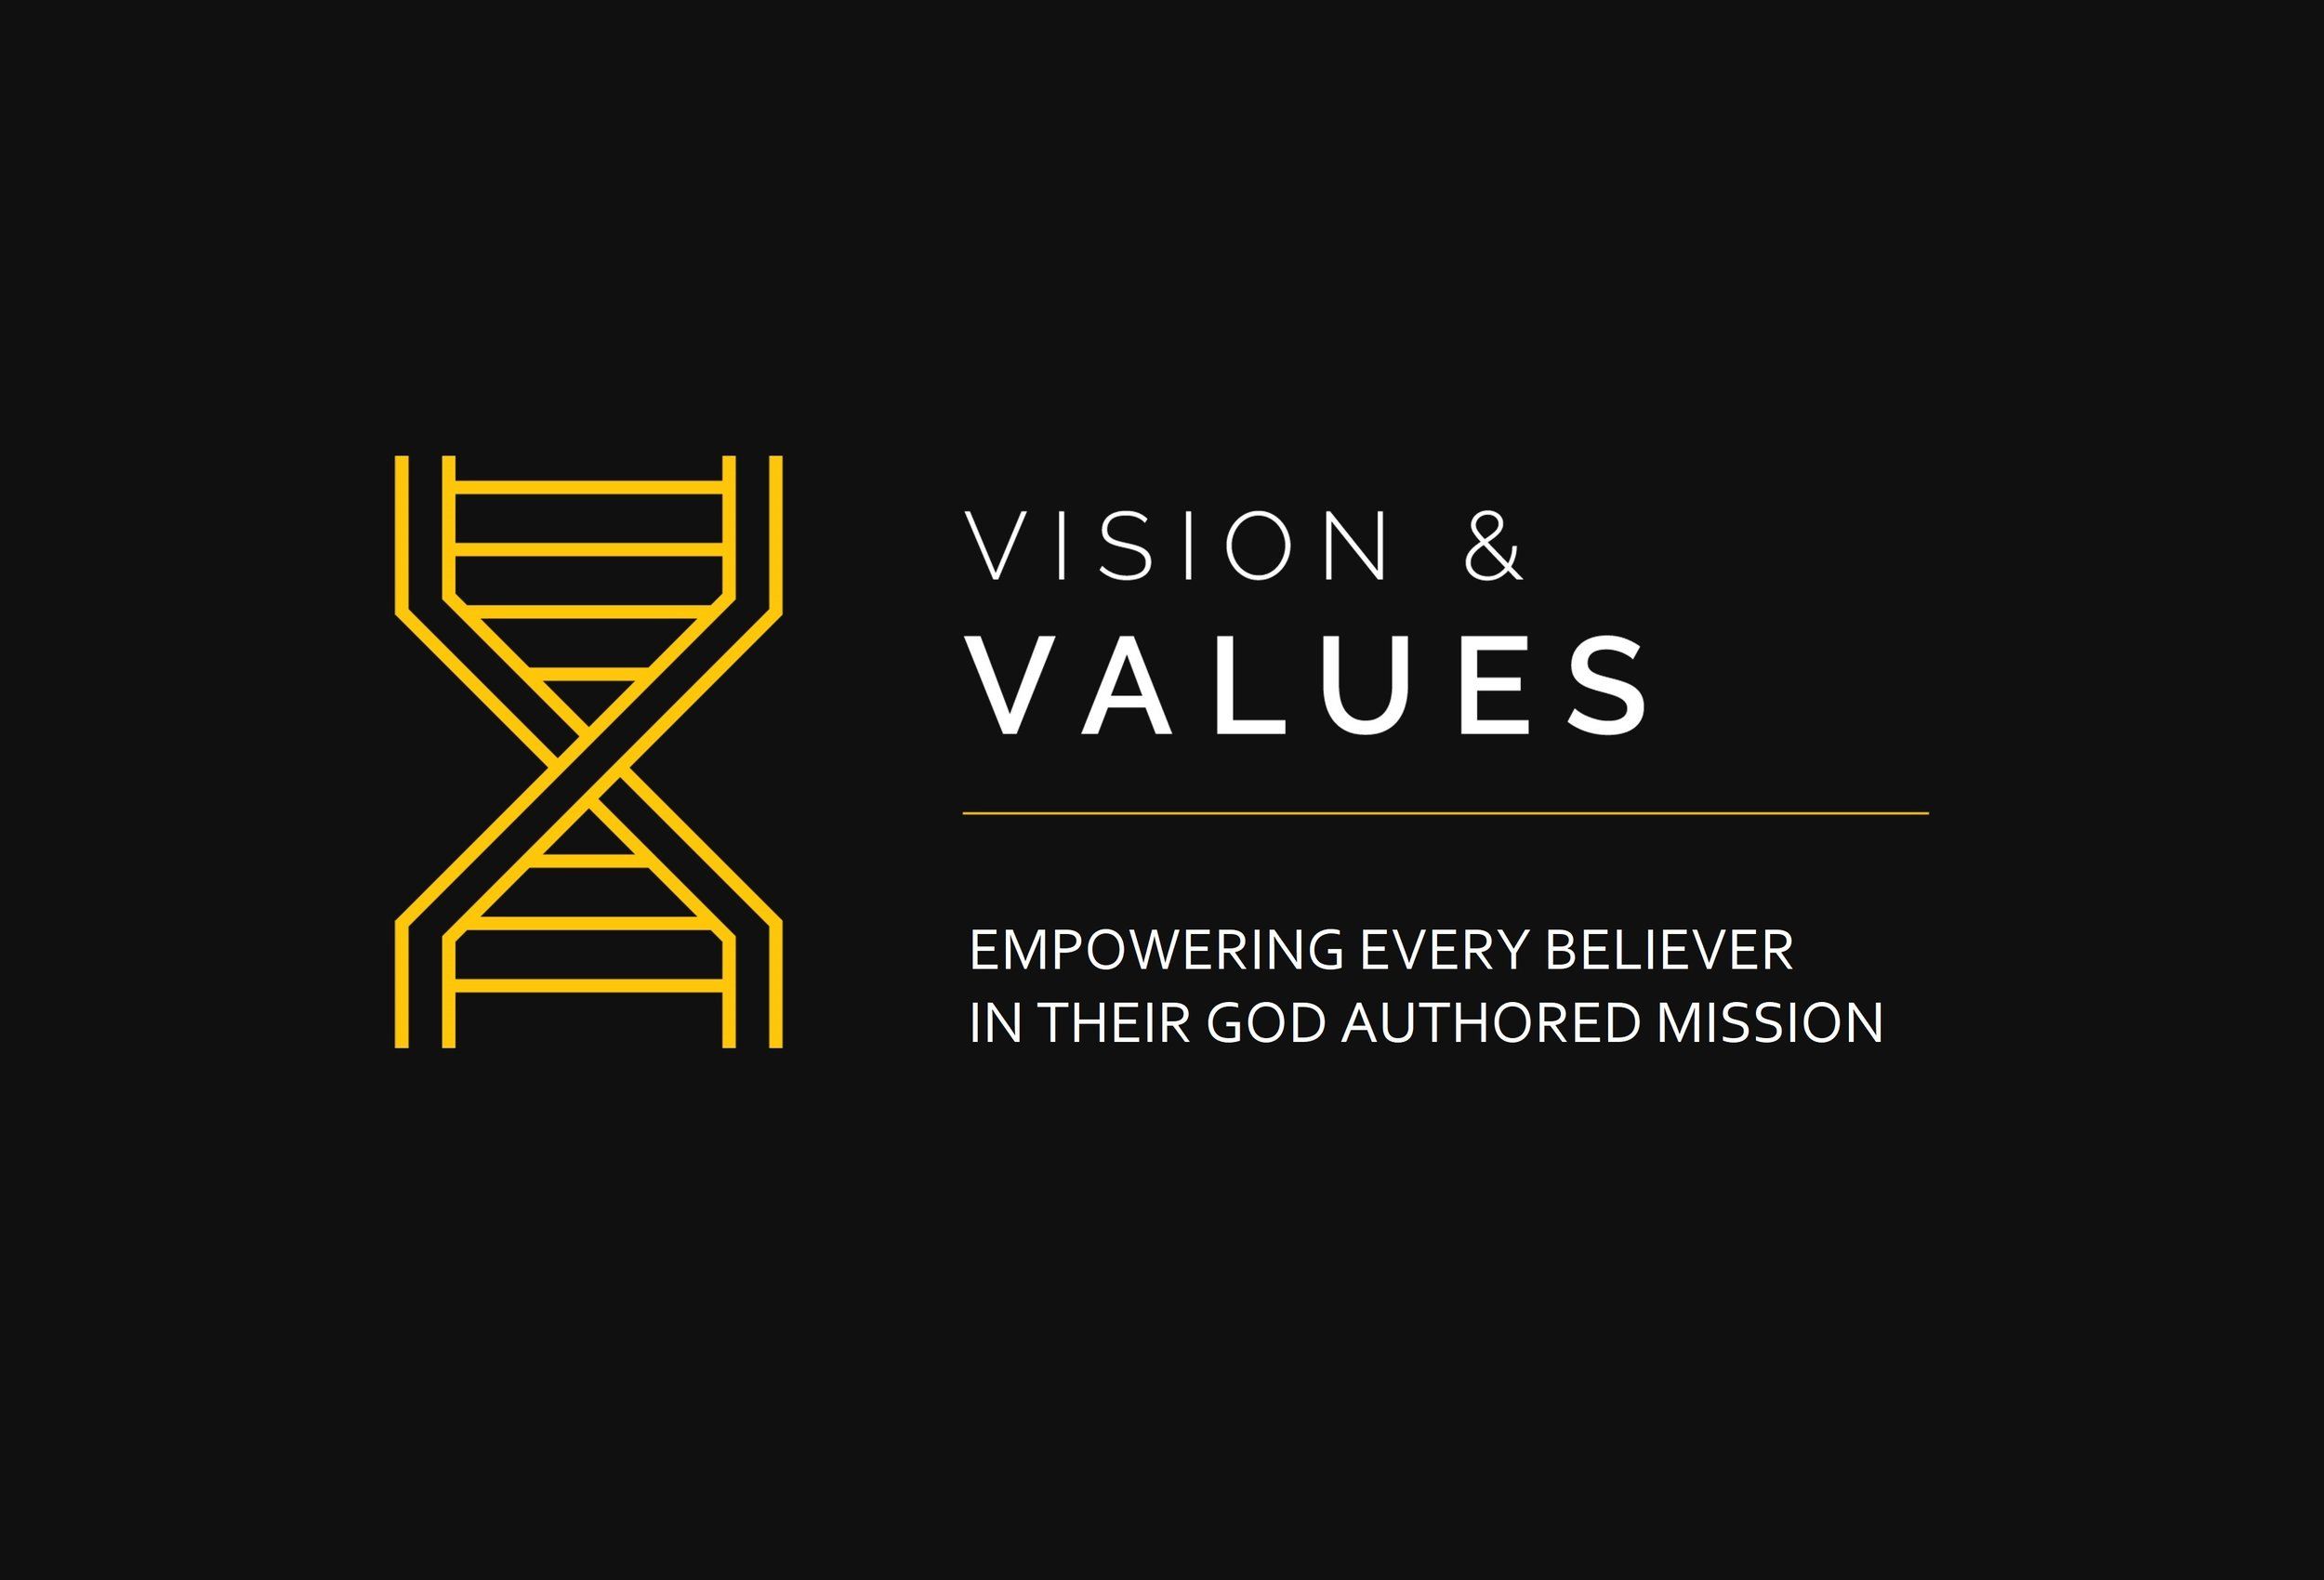 VisionValues-MISSION.jpg